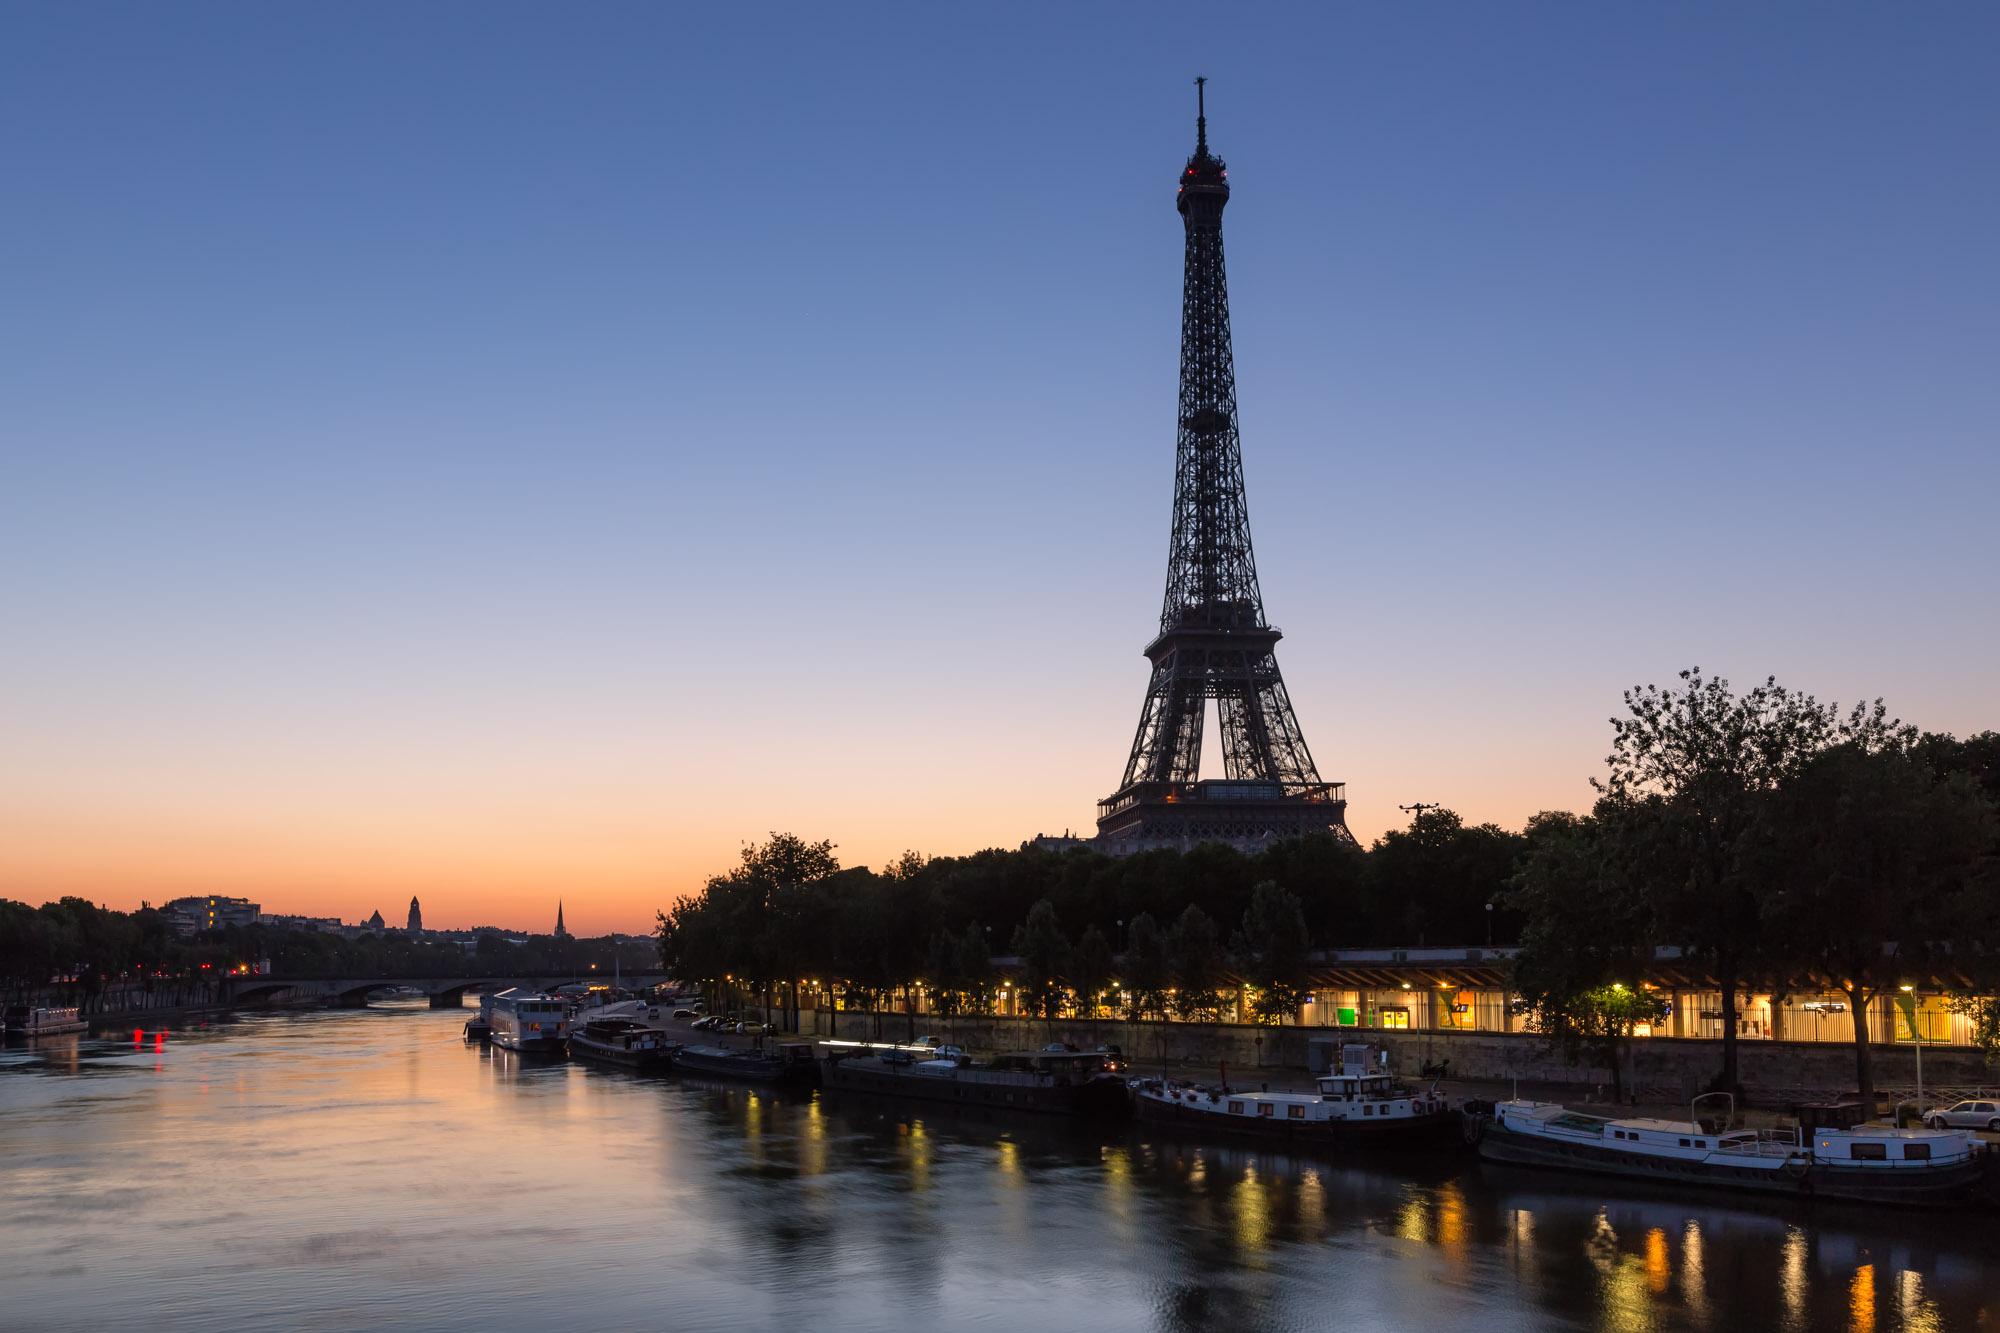 Eiffel Tower and Seine River, Paris, France